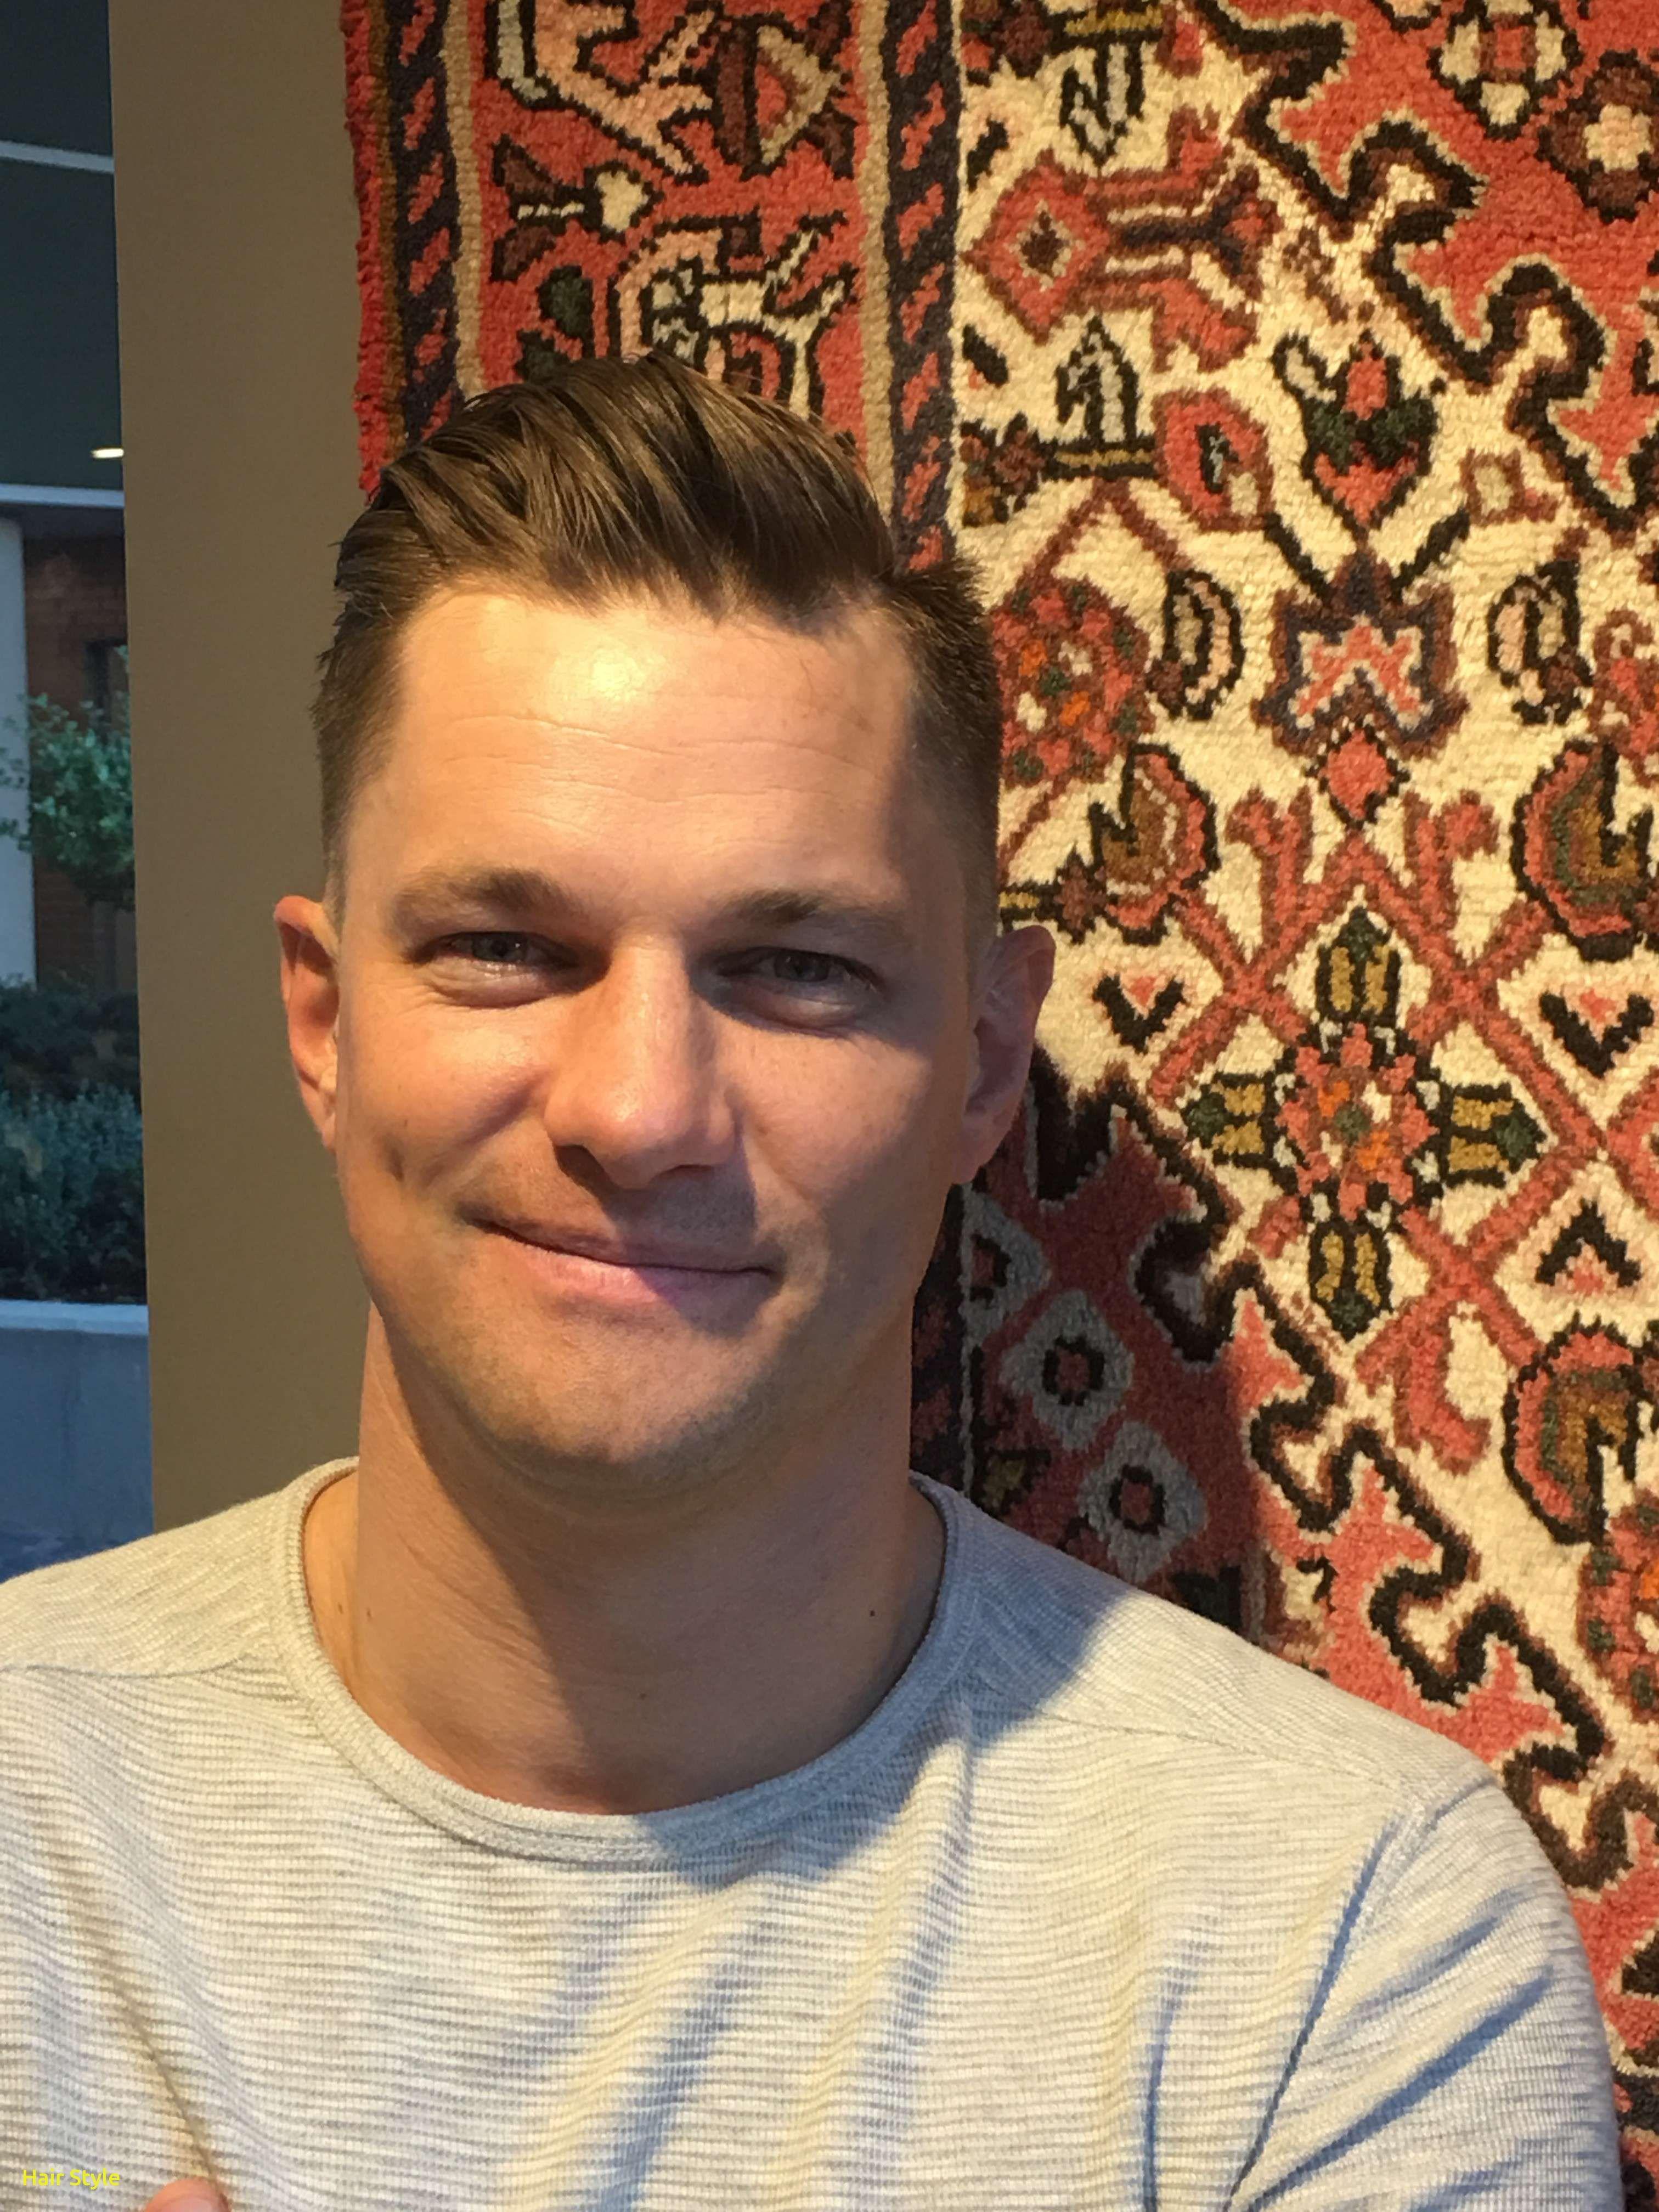 Fresh Professional Herren Frisuren 2018  haircut  kurzhaarfrisuren  barber   hairstylesmale  menhairstyles   1df76723f7